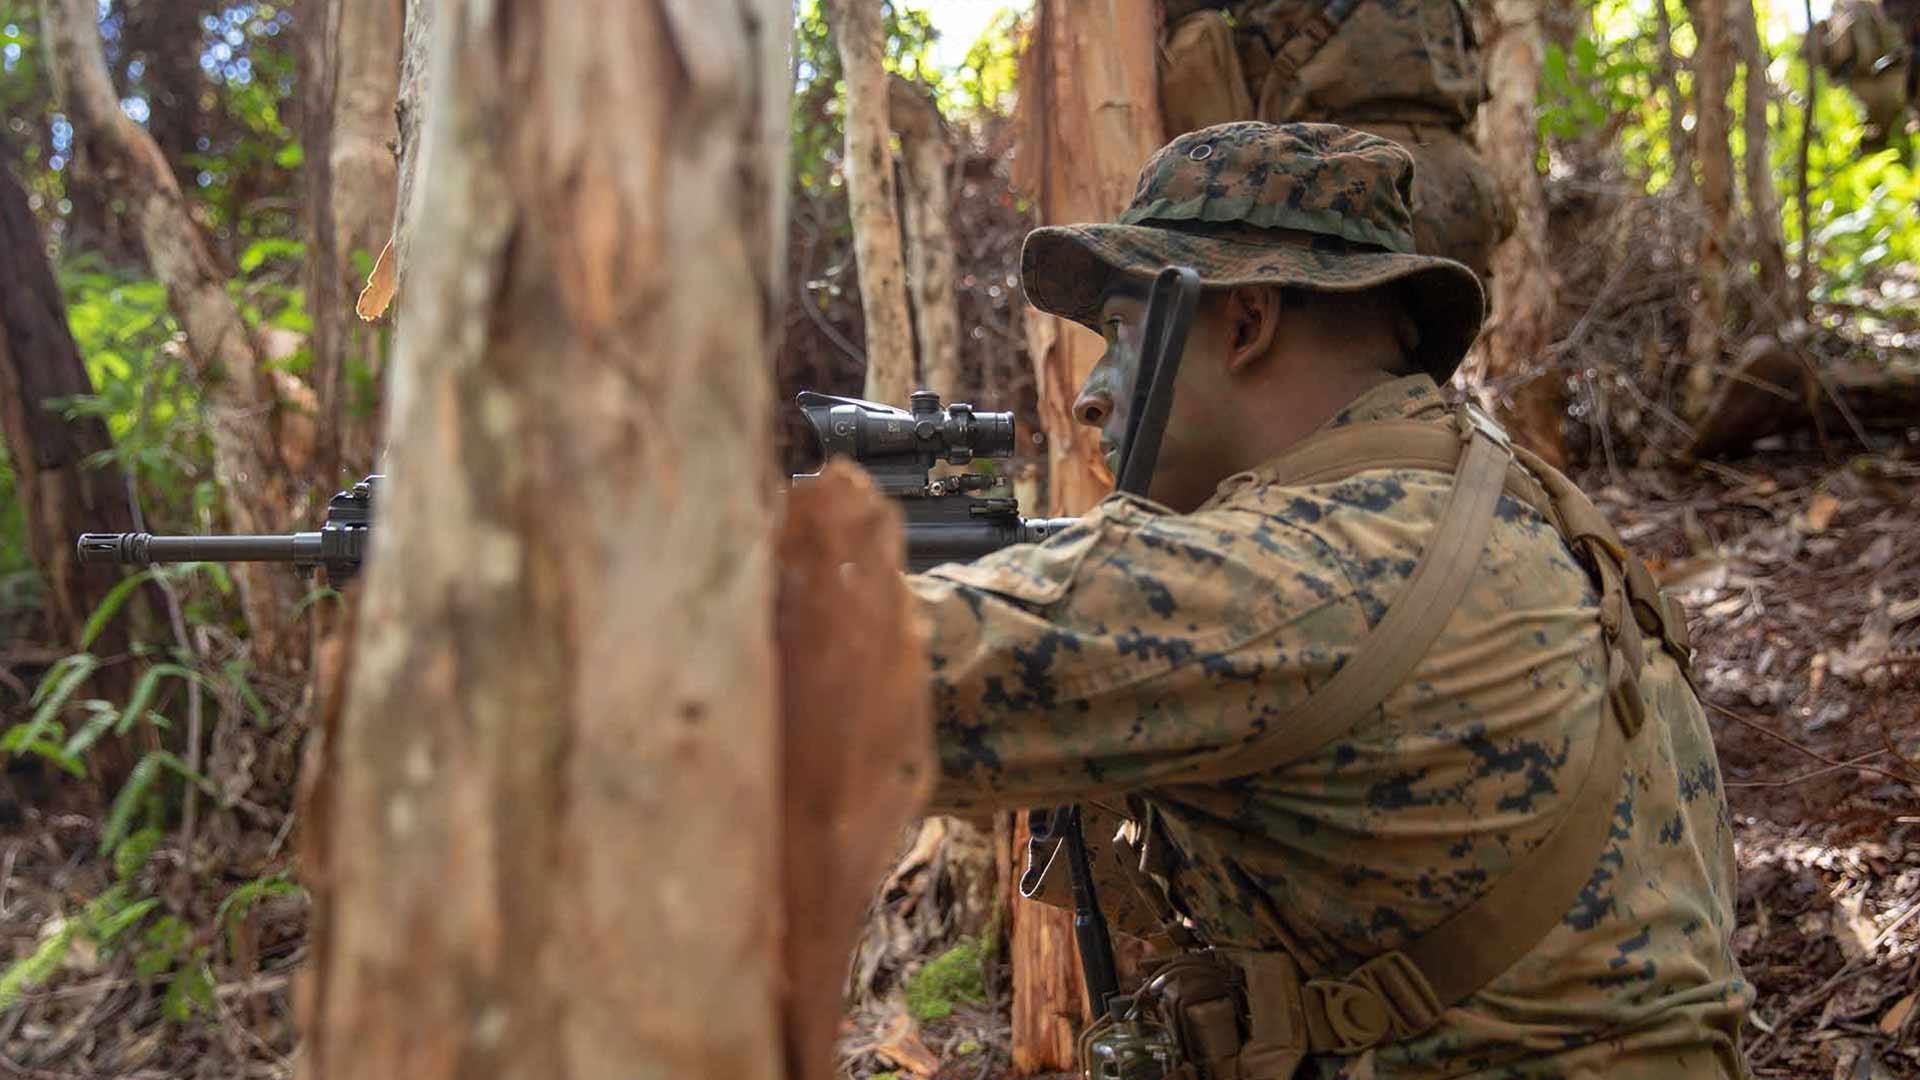 U.S. Marine Corps Sgt. Allen Valdez with kilo company, 3rd Battalion, 3rd Marine Regiment sights down range during a squad patrol at Schofield Barracks, Hawaii, Feb. 25, 2020.